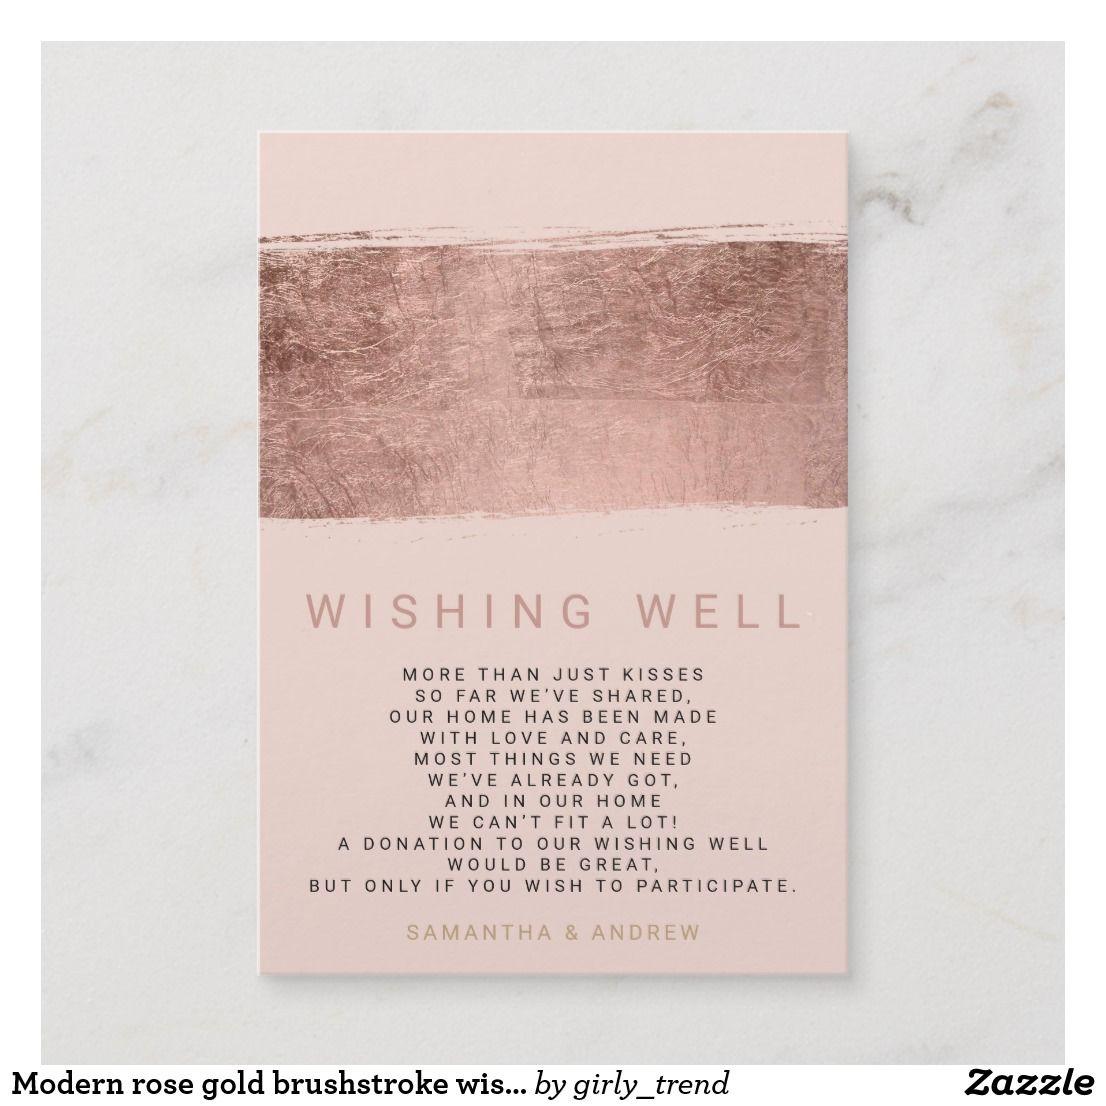 Modern rose gold brushstroke wishing well wedding enclosure card ...